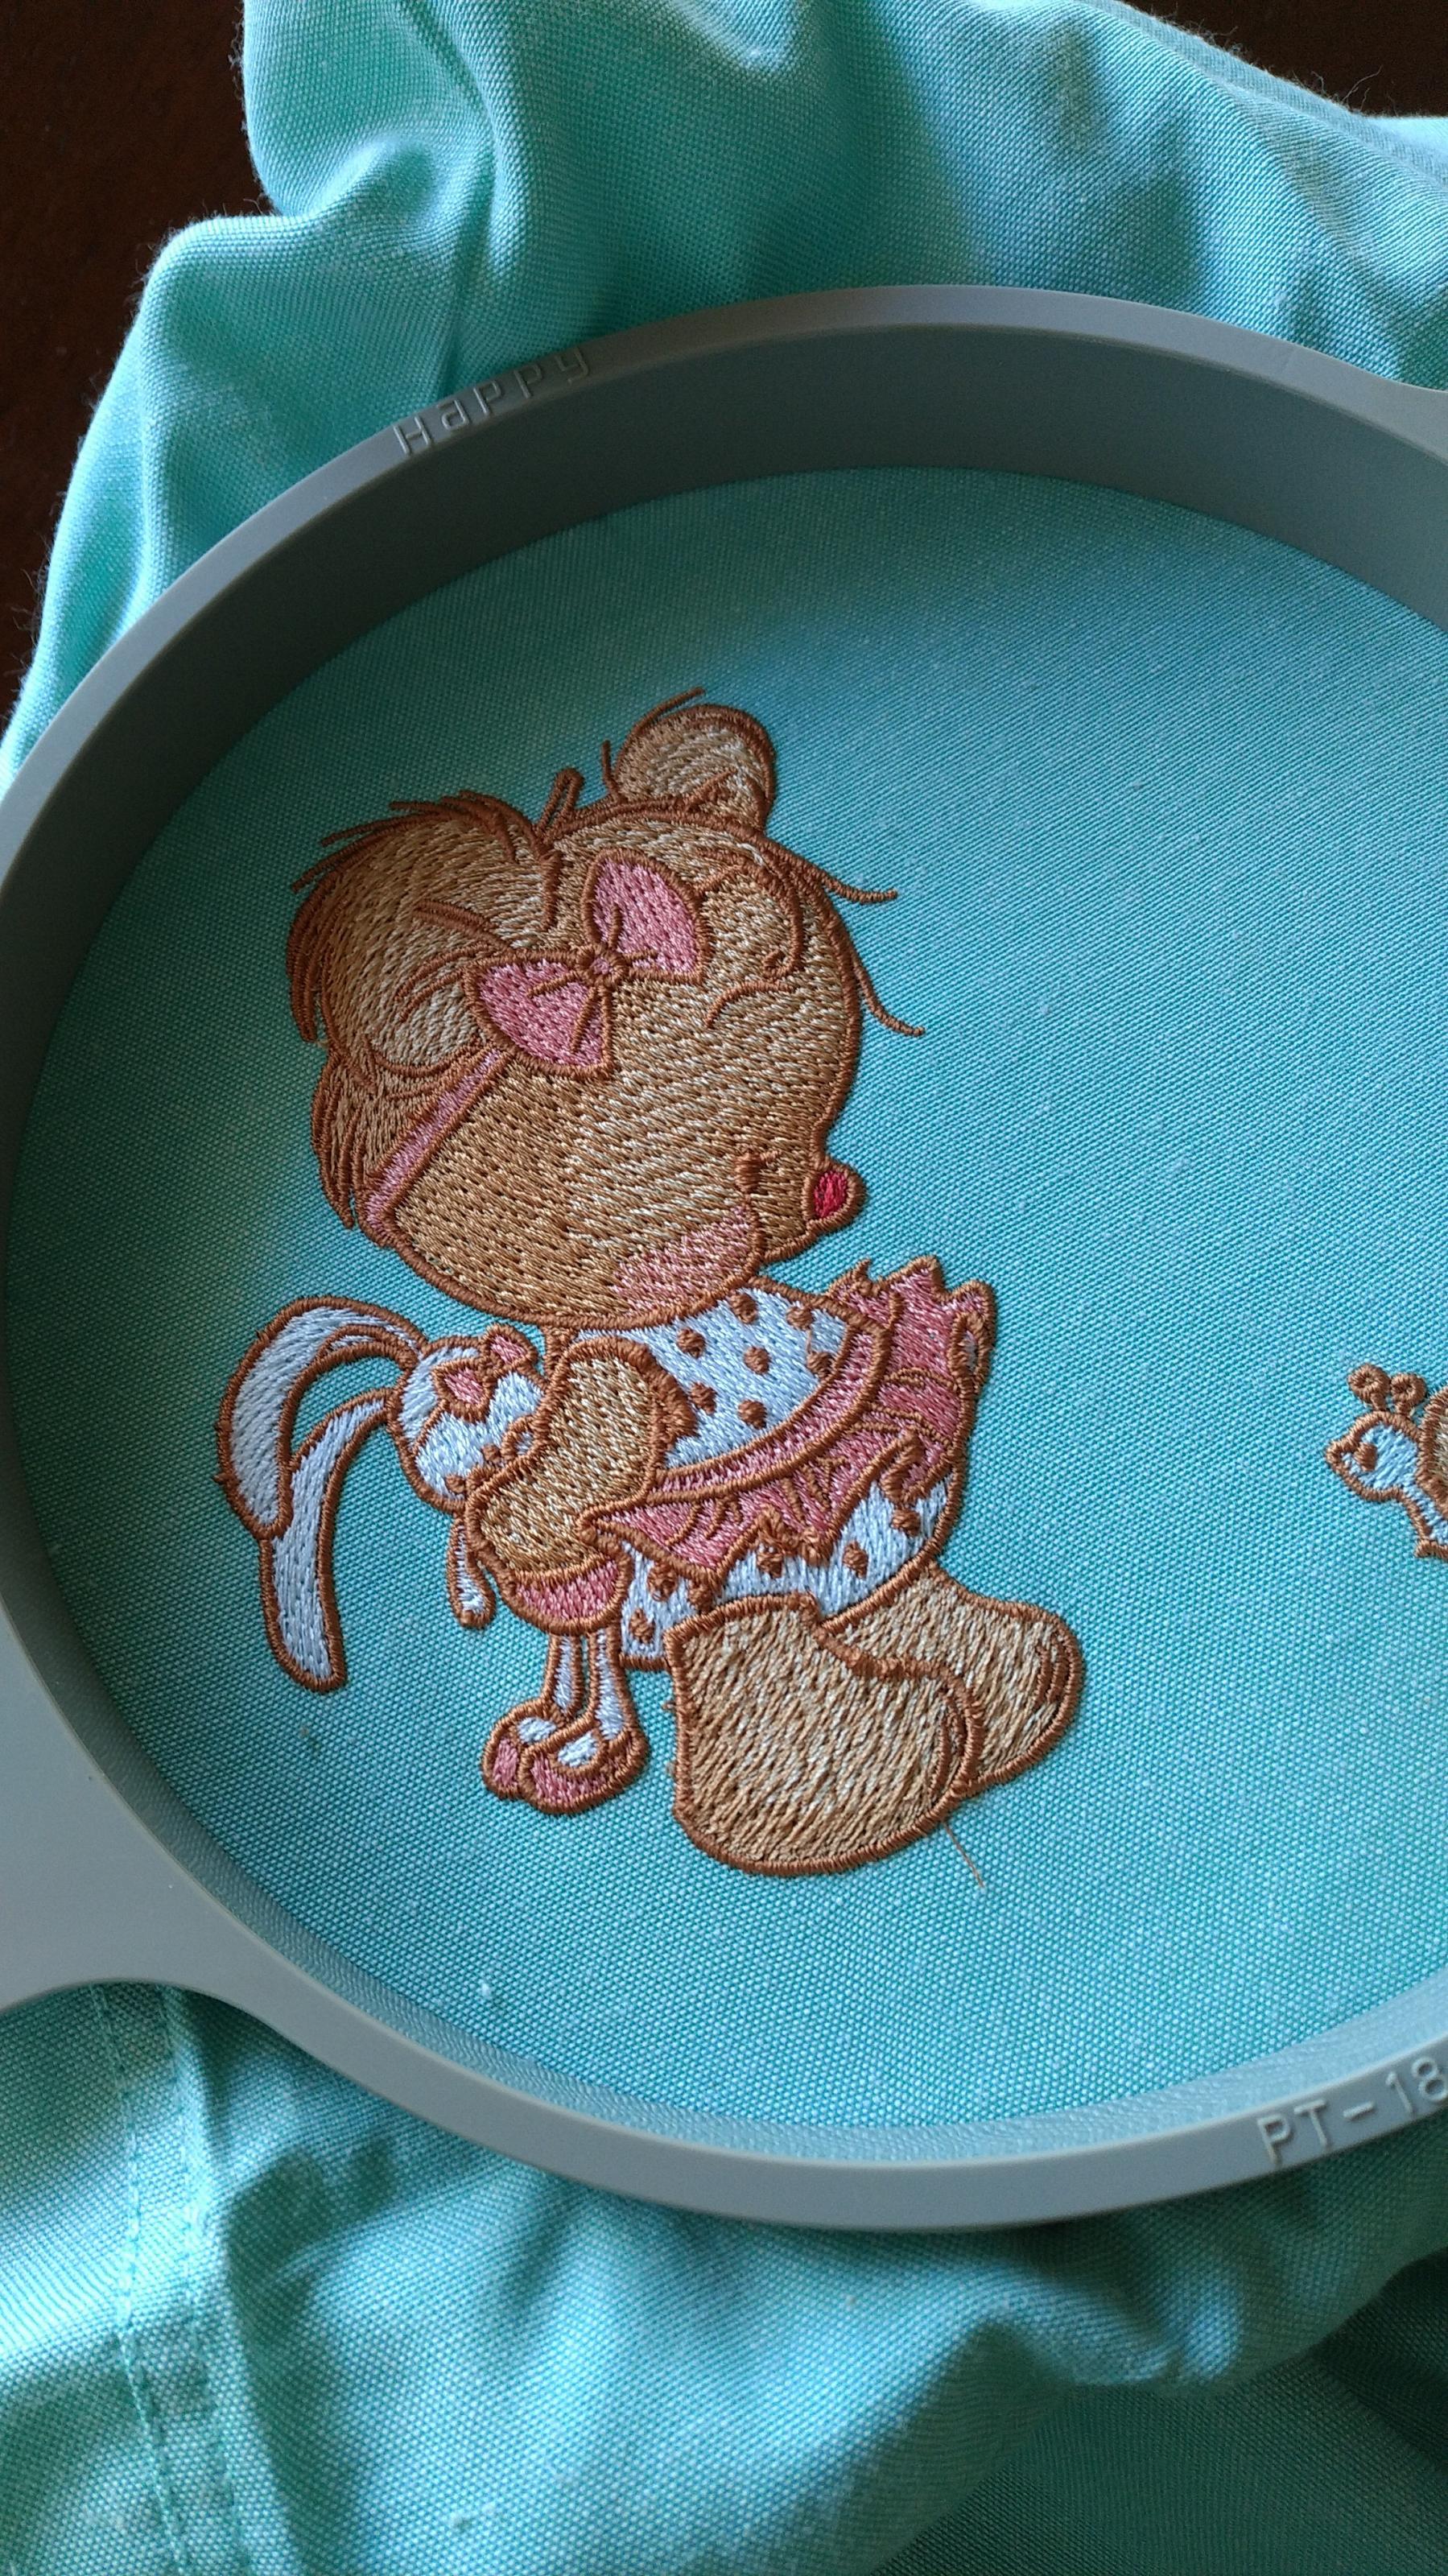 In hoop shy teddy bear embroidery design